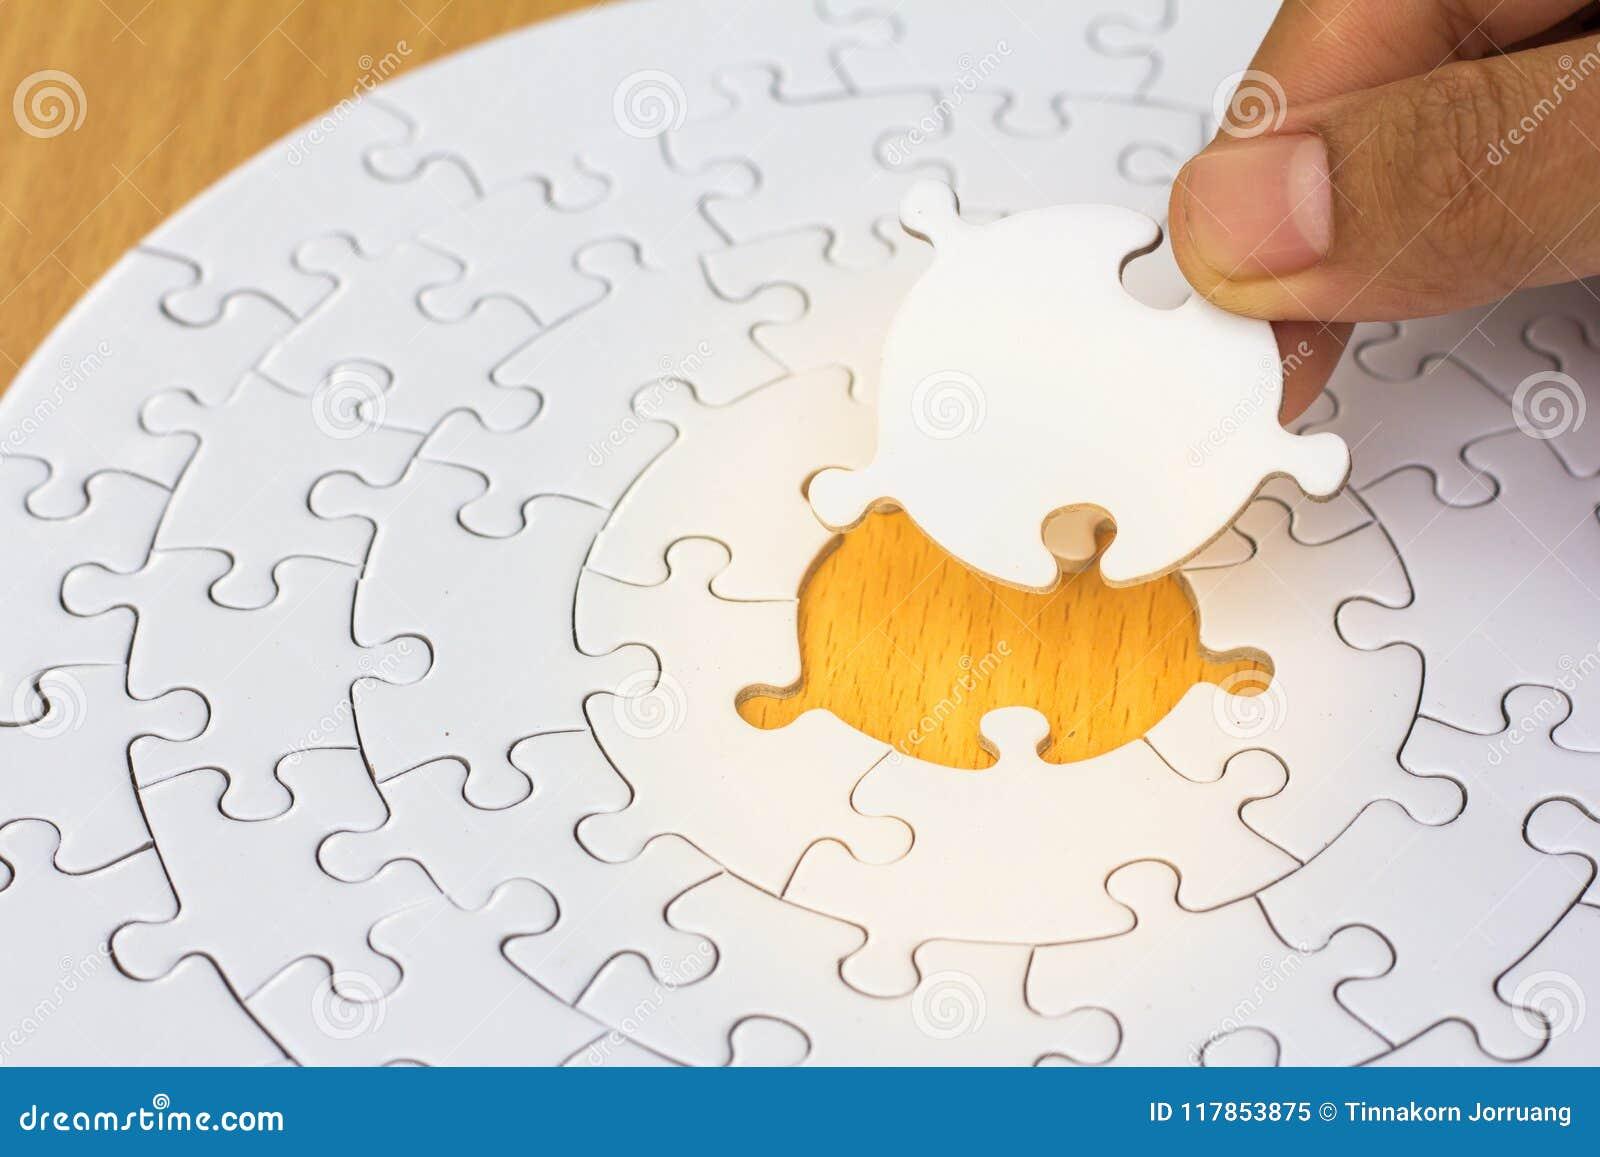 Hands Put The Final Piece Of Jigsaw Successful Business Ideas Stock